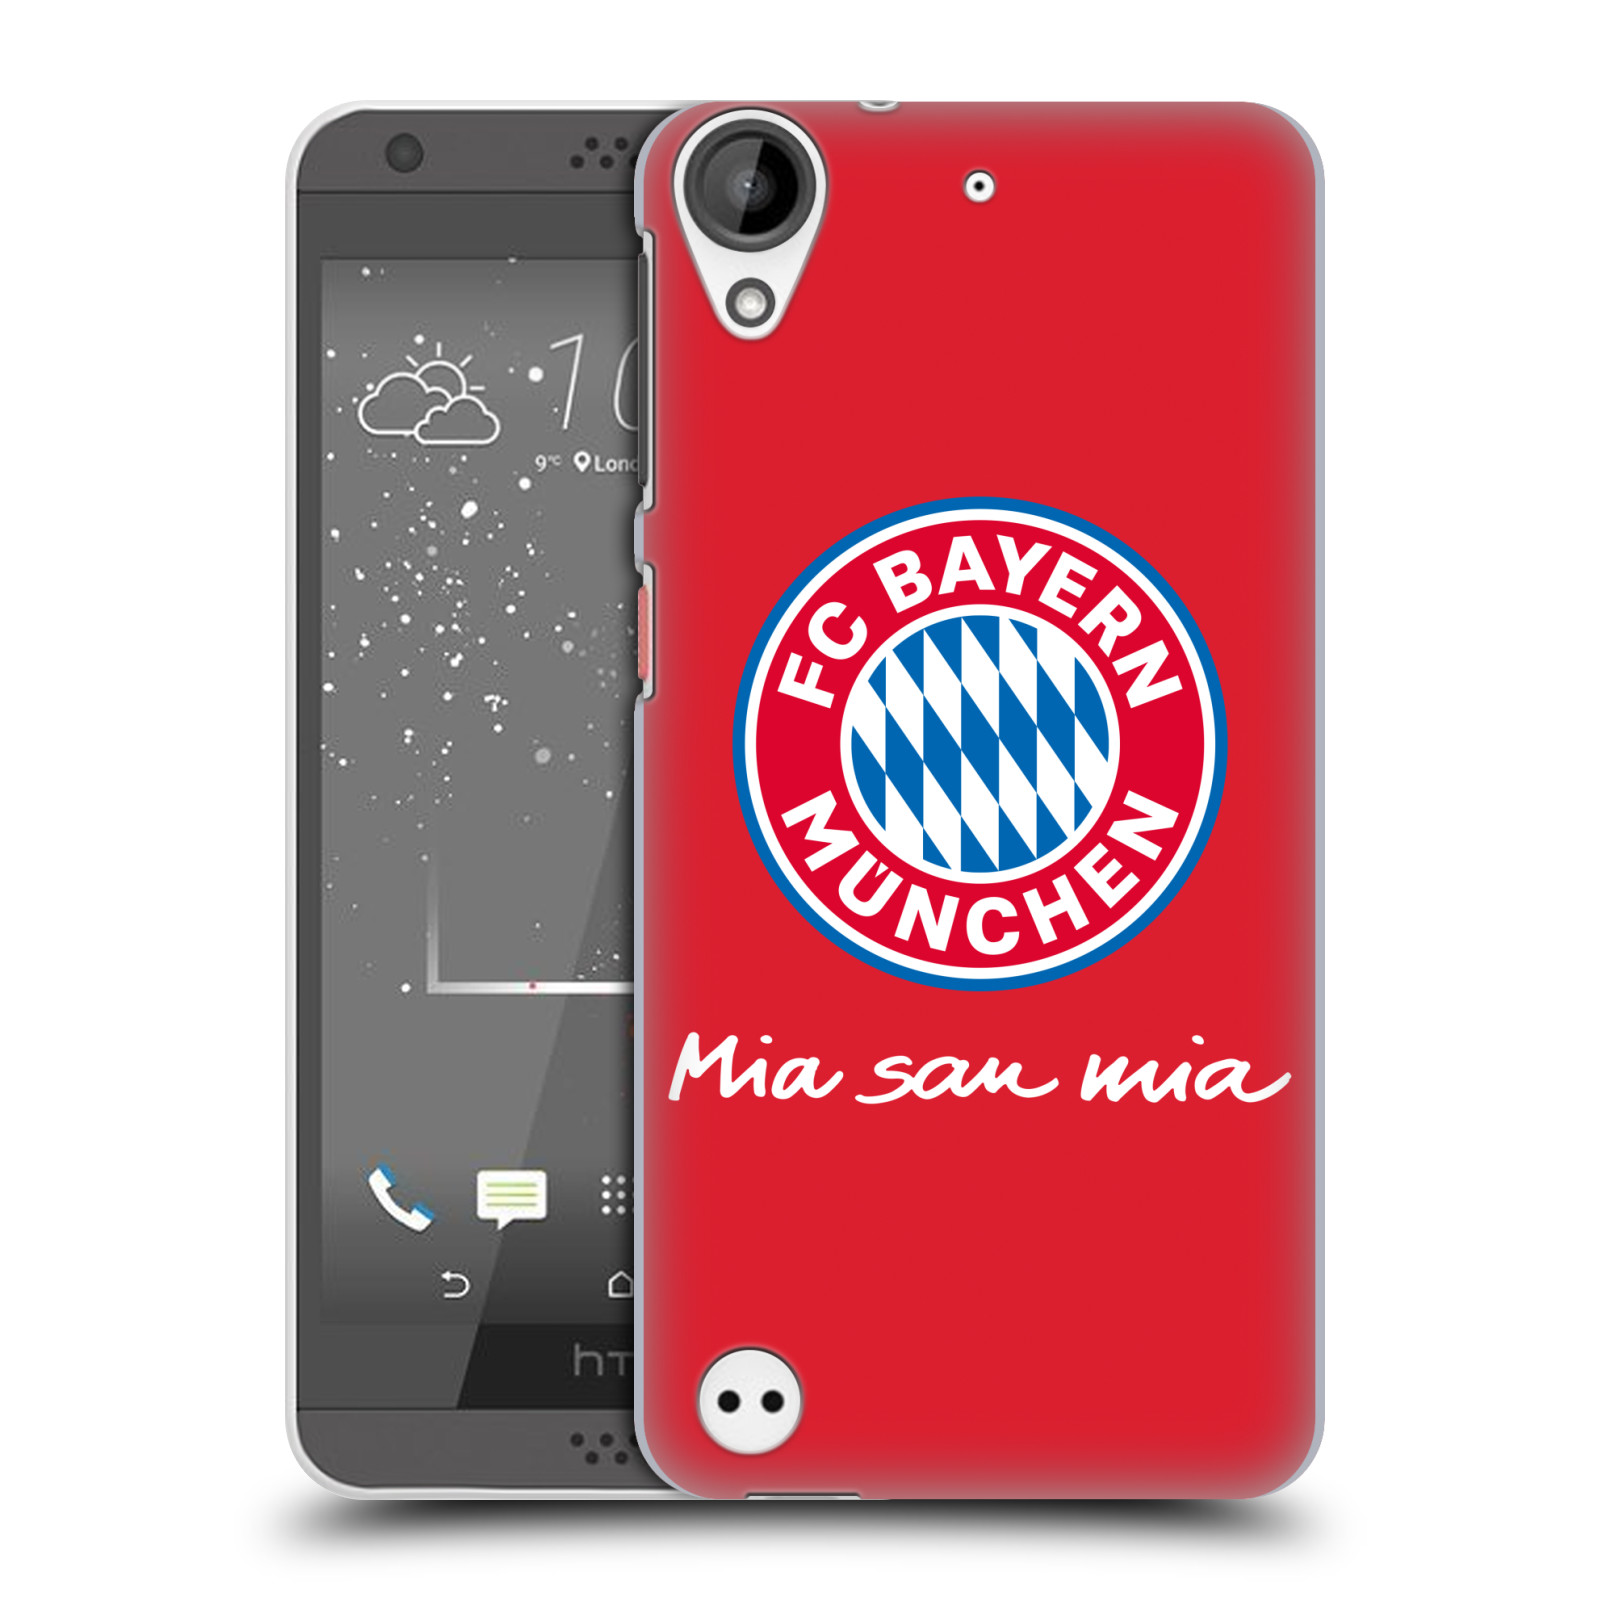 Plastové pouzdro na mobil HTC Desire 530 - Head Case - FC Bayern Mnichov - Mia san mia